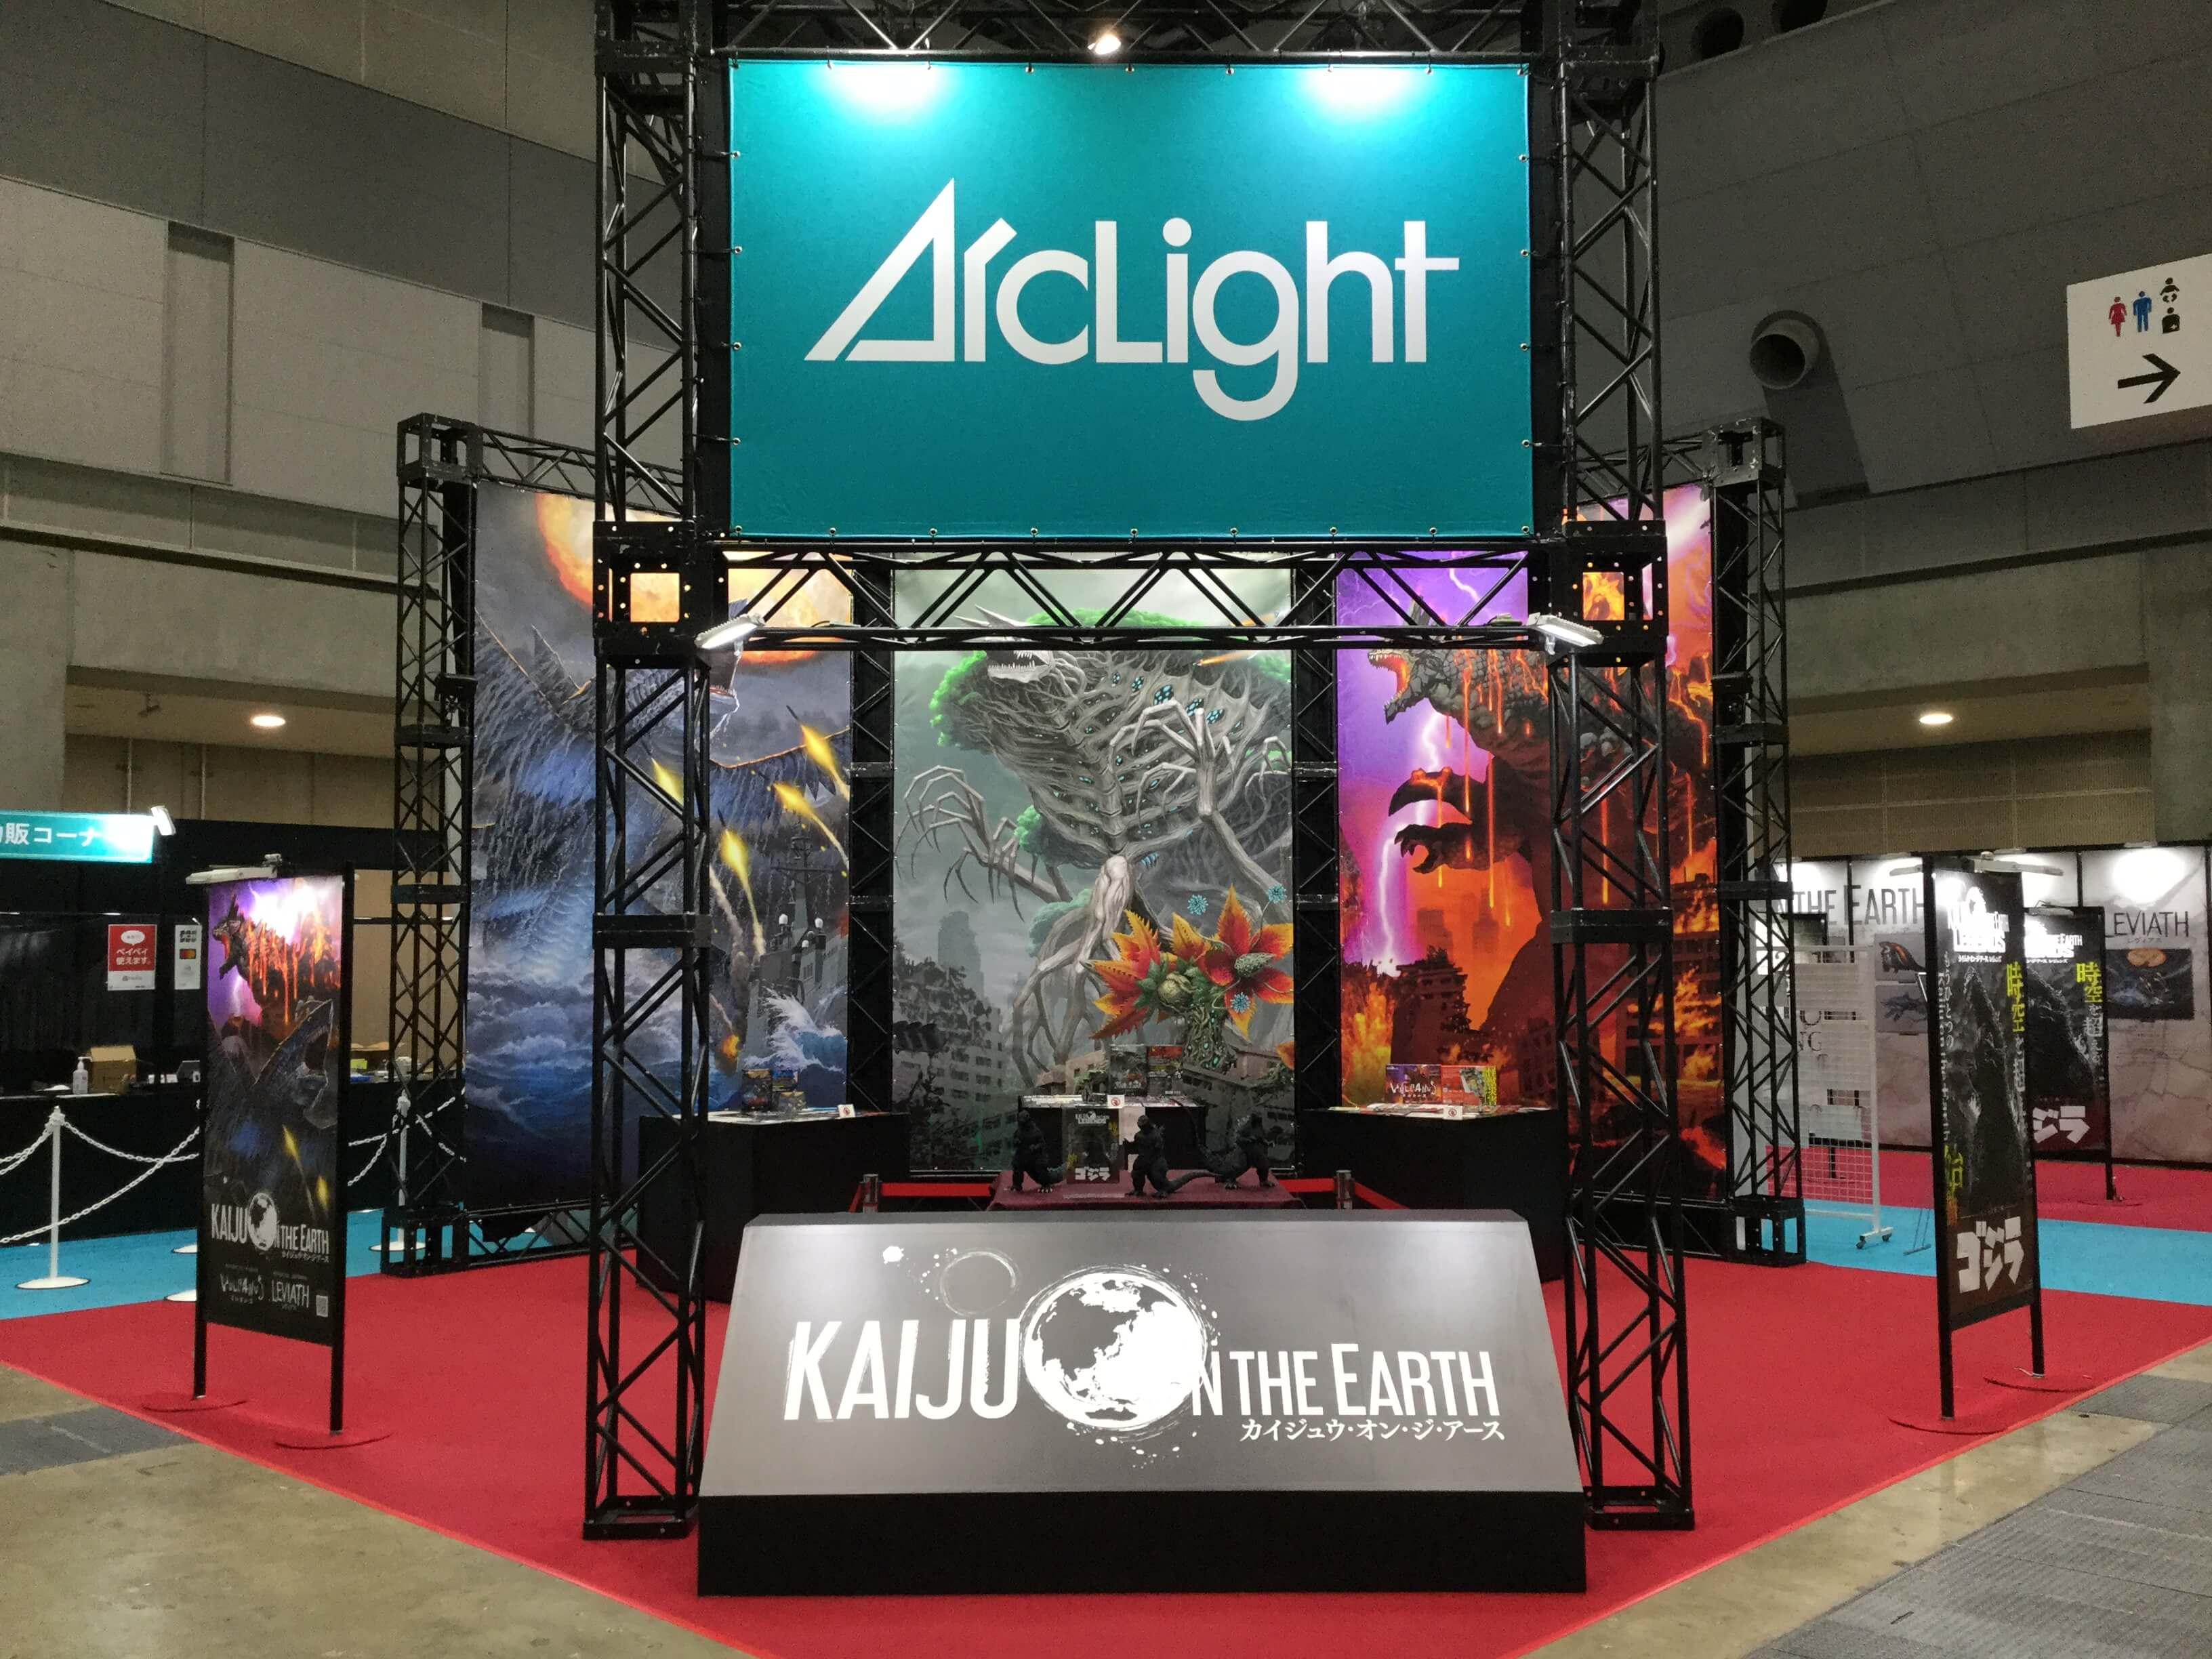 kaiju-on-the-earth-legends-5-1-2